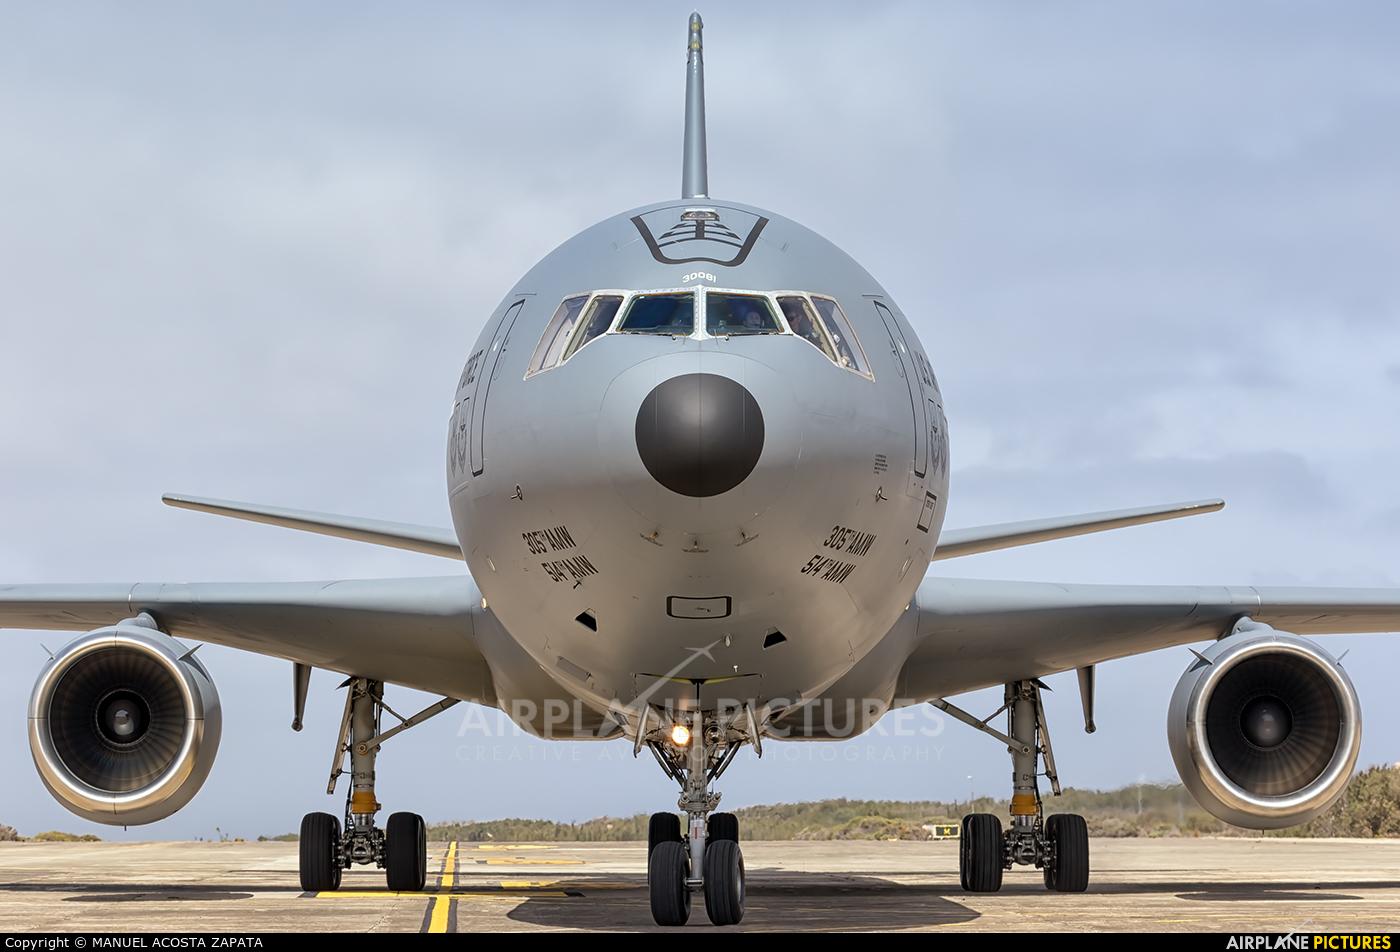 USA - Air Force 83-0081 aircraft at Aeropuerto de Gran Canaria